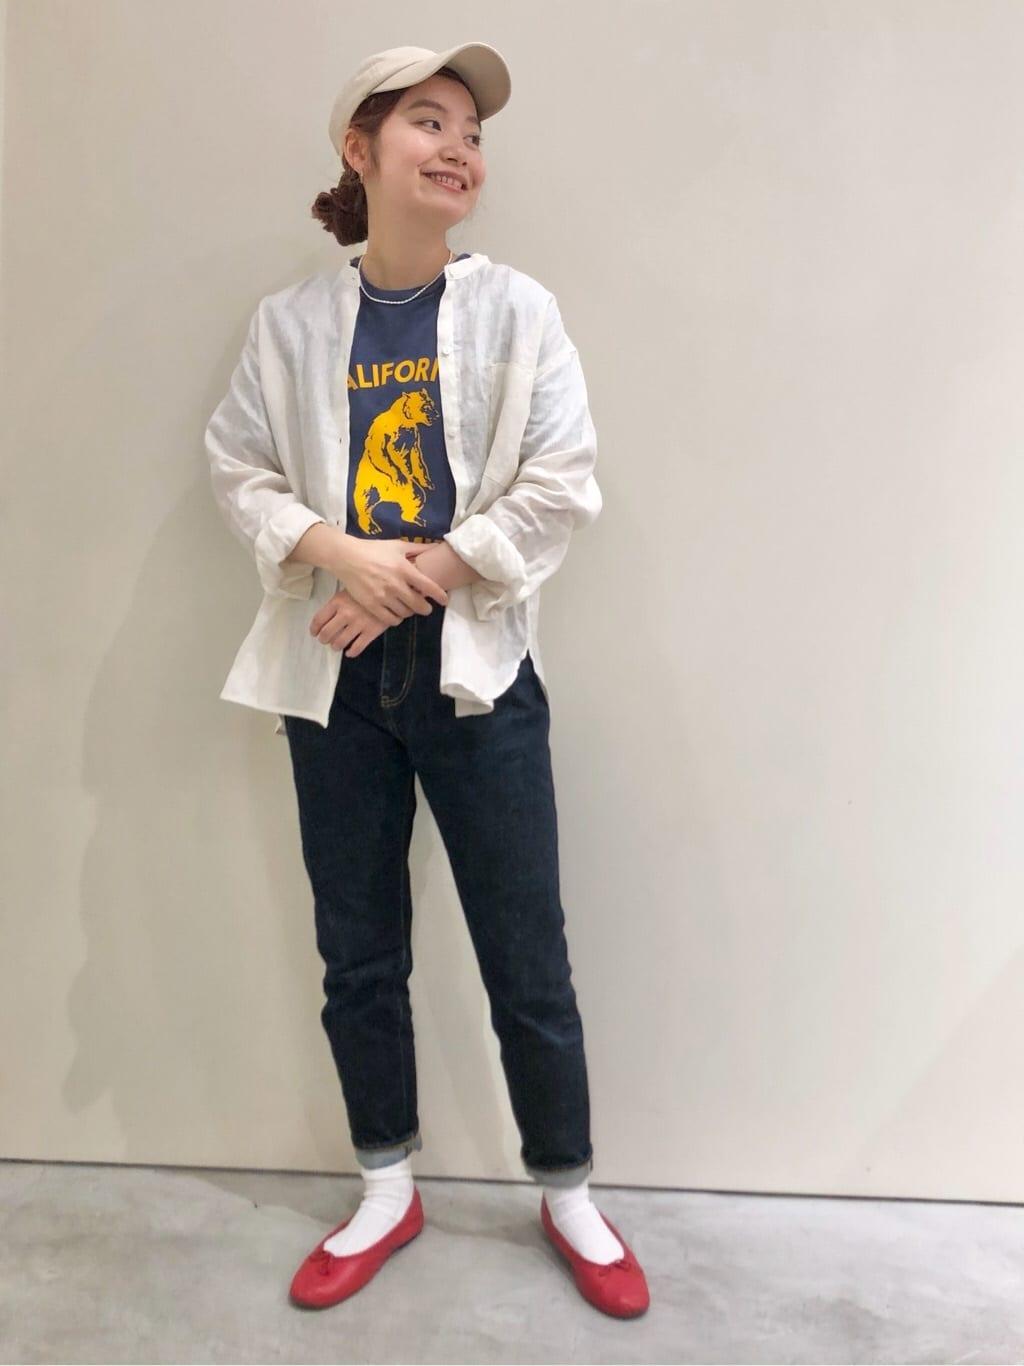 Dot and Stripes CHILD WOMAN CHILD WOMAN , PAR ICI 新宿ミロード 身長:160cm 2021.07.02